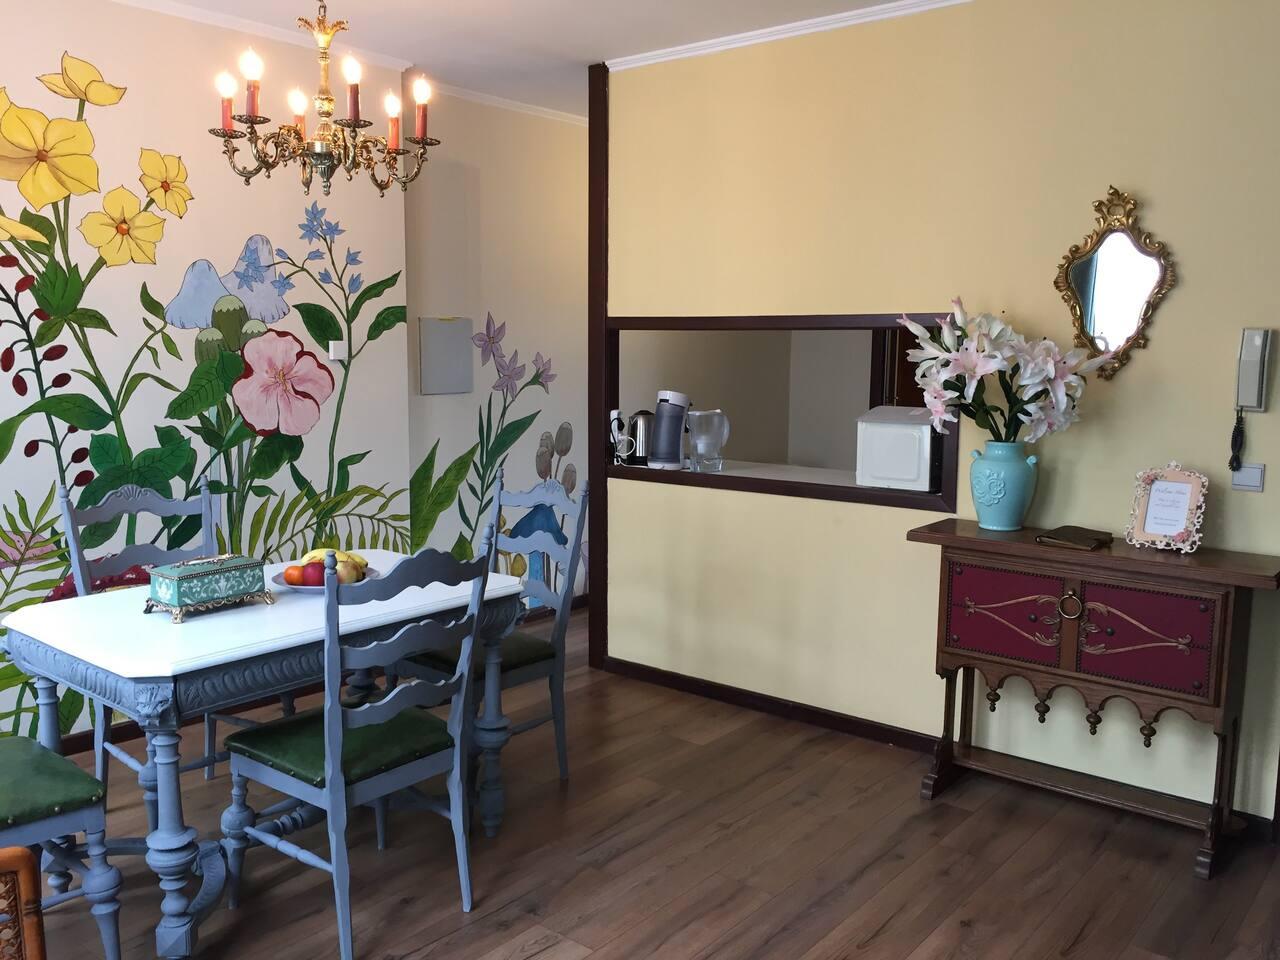 One bedroom apartment 50 m2